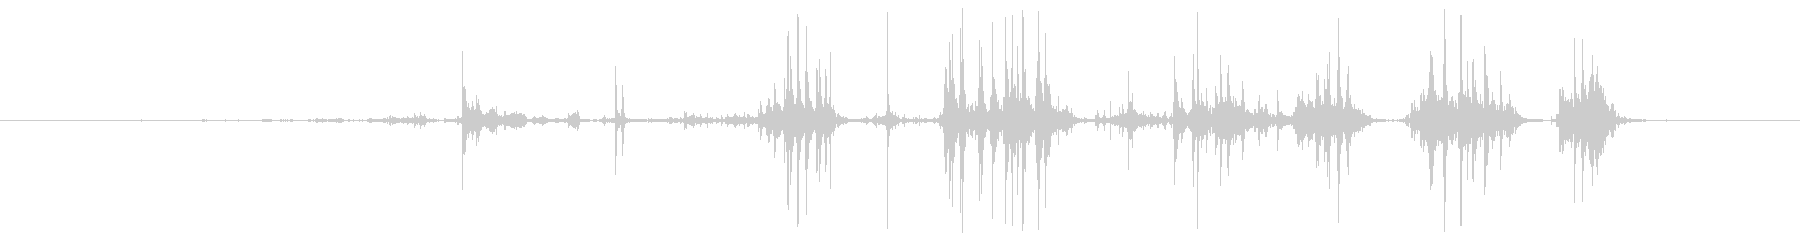 【YouTube】【物音】封を切る_05の未再生の波形